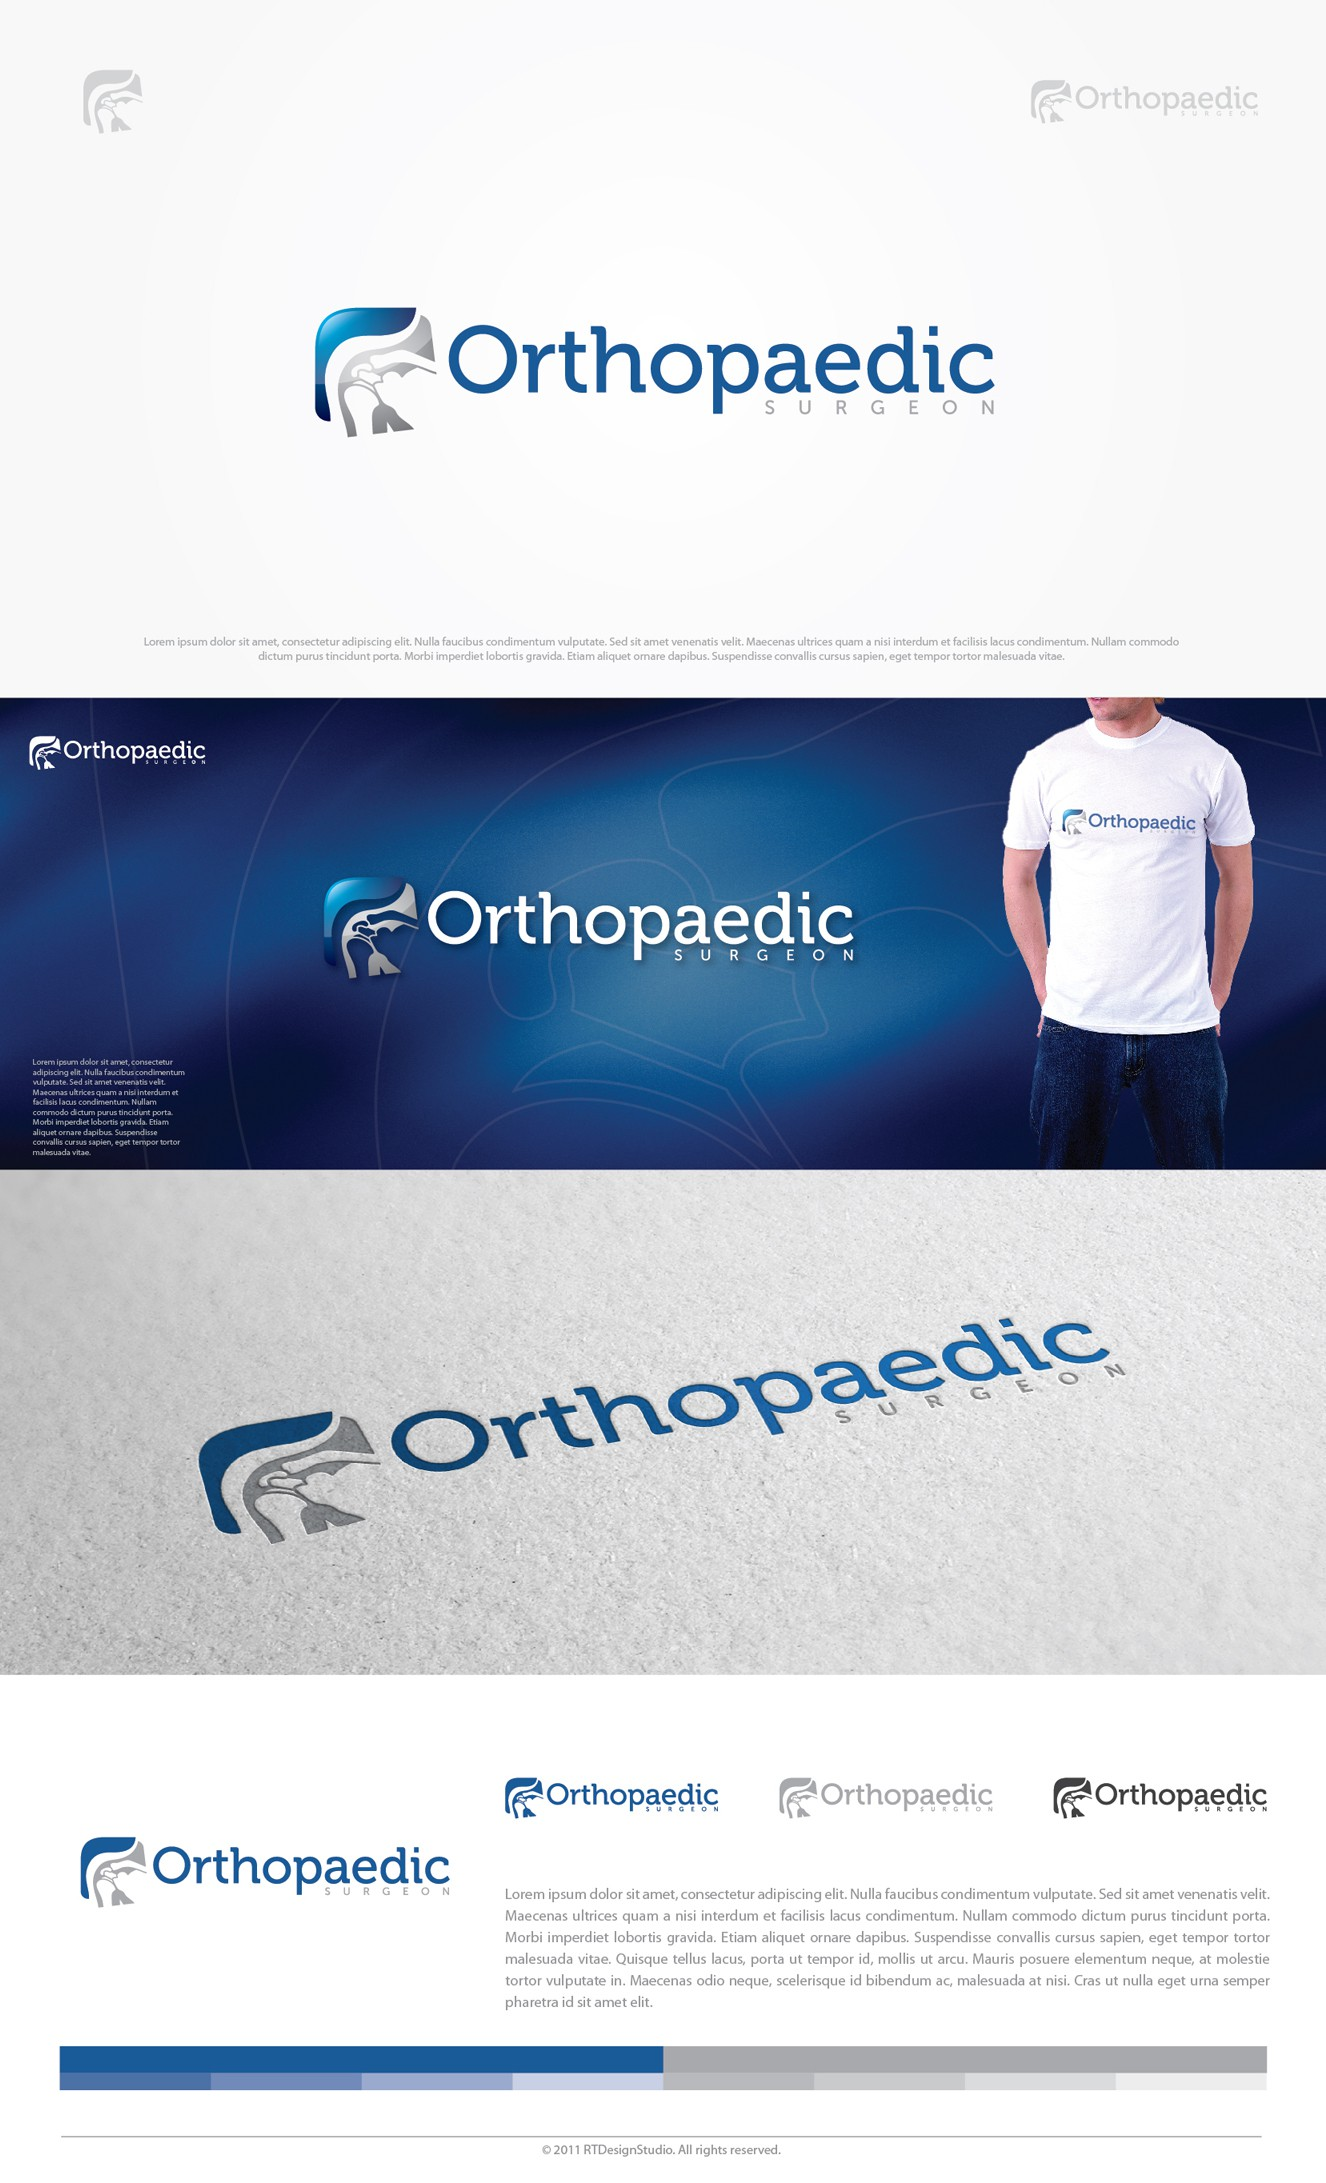 logo for Orthopaedic Surgeon